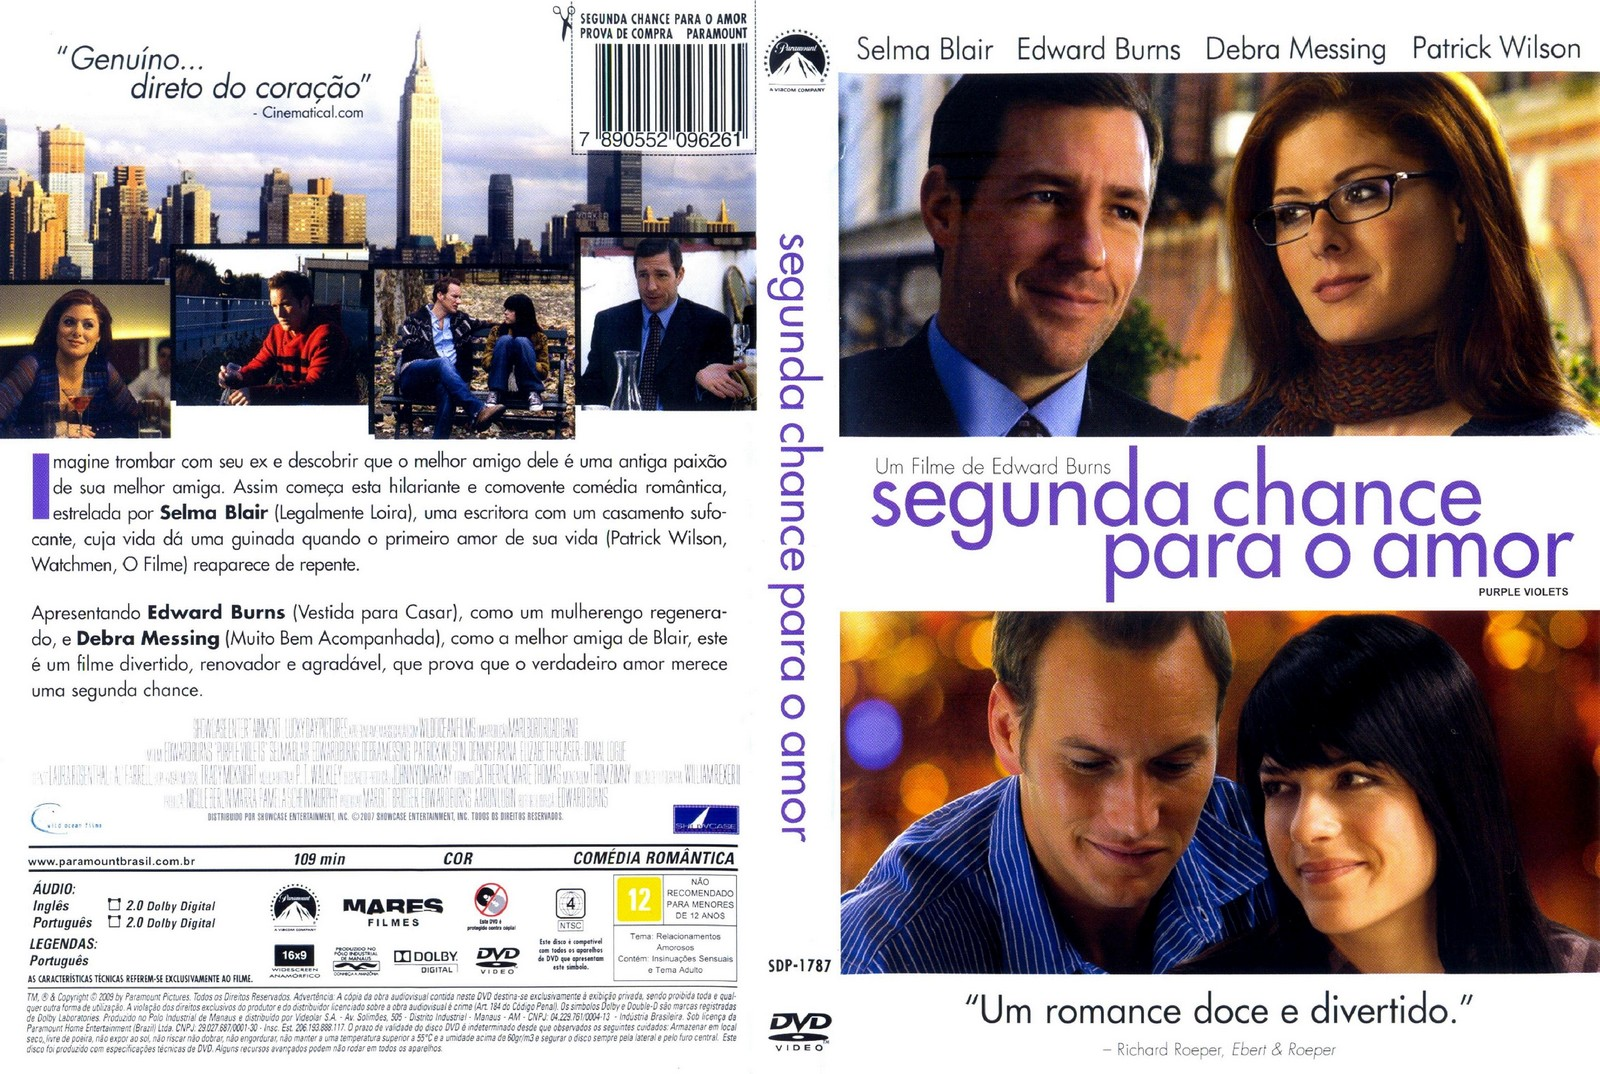 http://1.bp.blogspot.com/-lK5Qd-3q5a0/ULlBES2_5dI/AAAAAAAAAZ4/0gnNZ6BQEIw/s1600/Segunda+Chance+Para+O+Amor.jpg